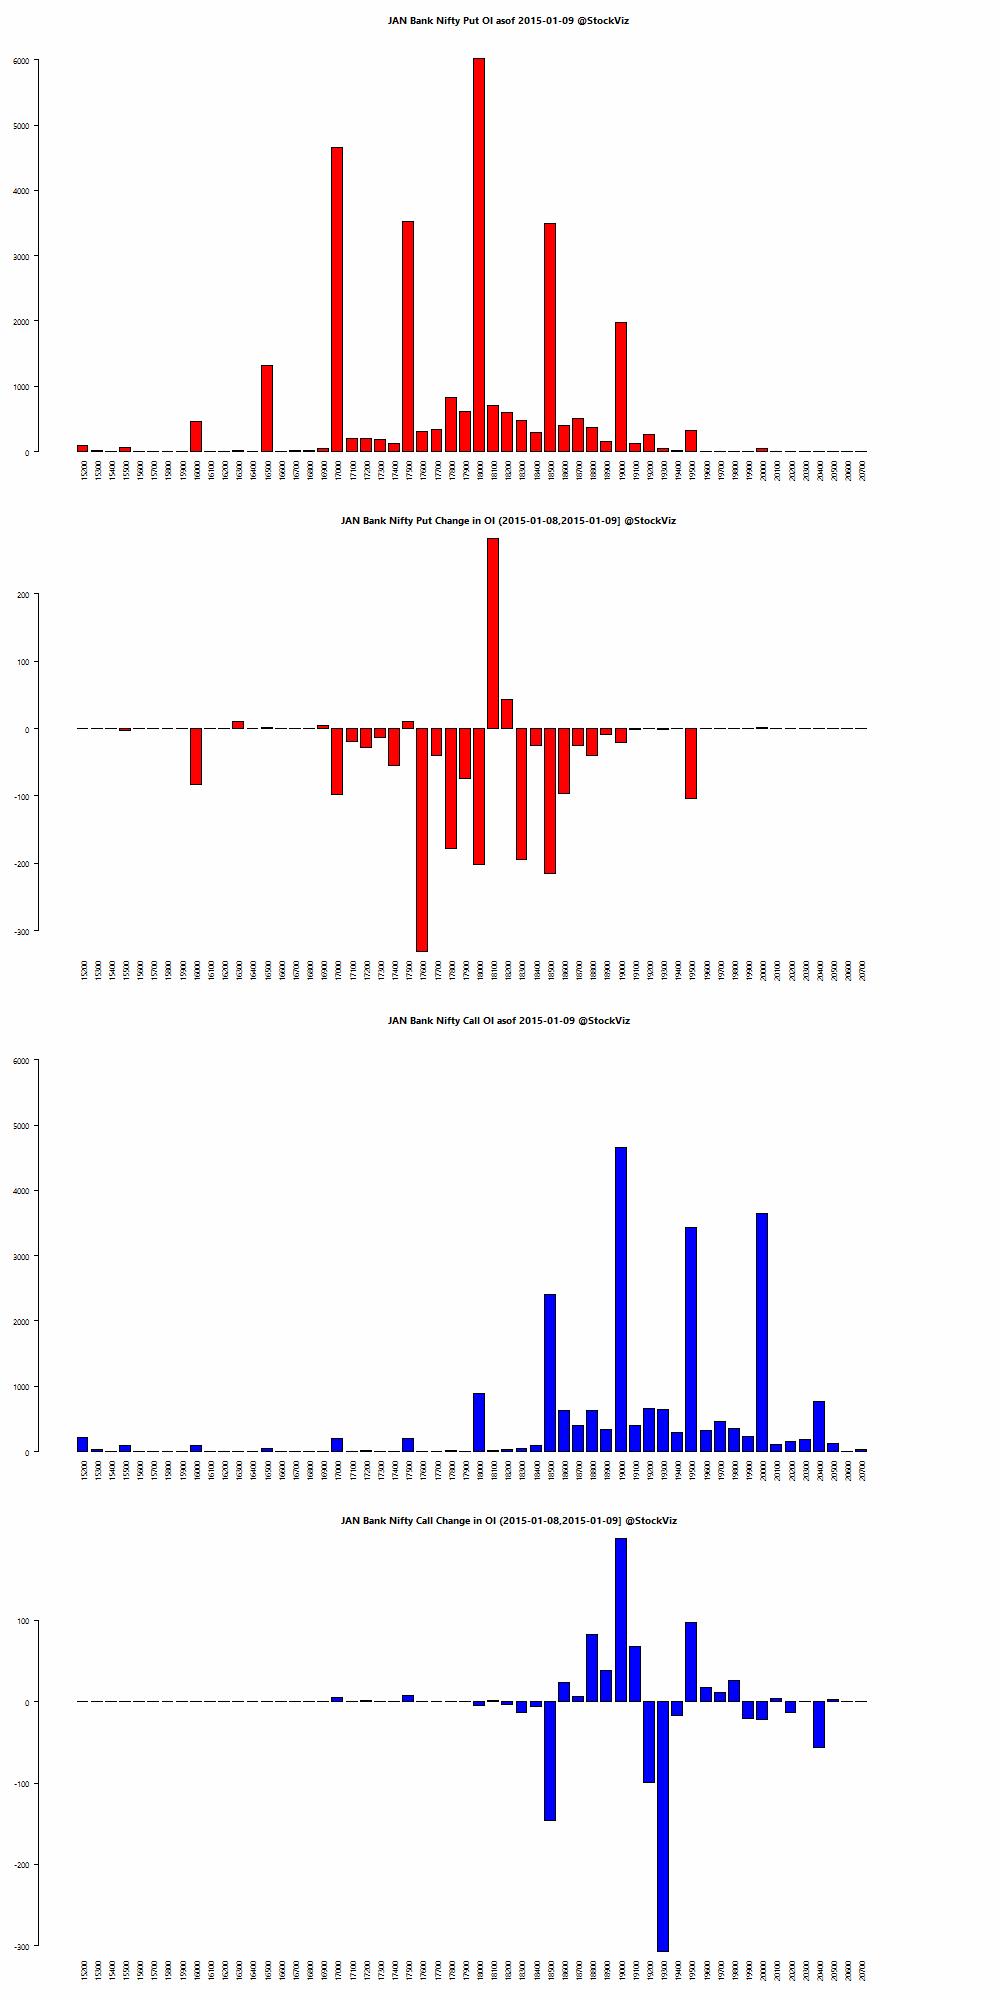 JAN BANKNIFTY OI chart